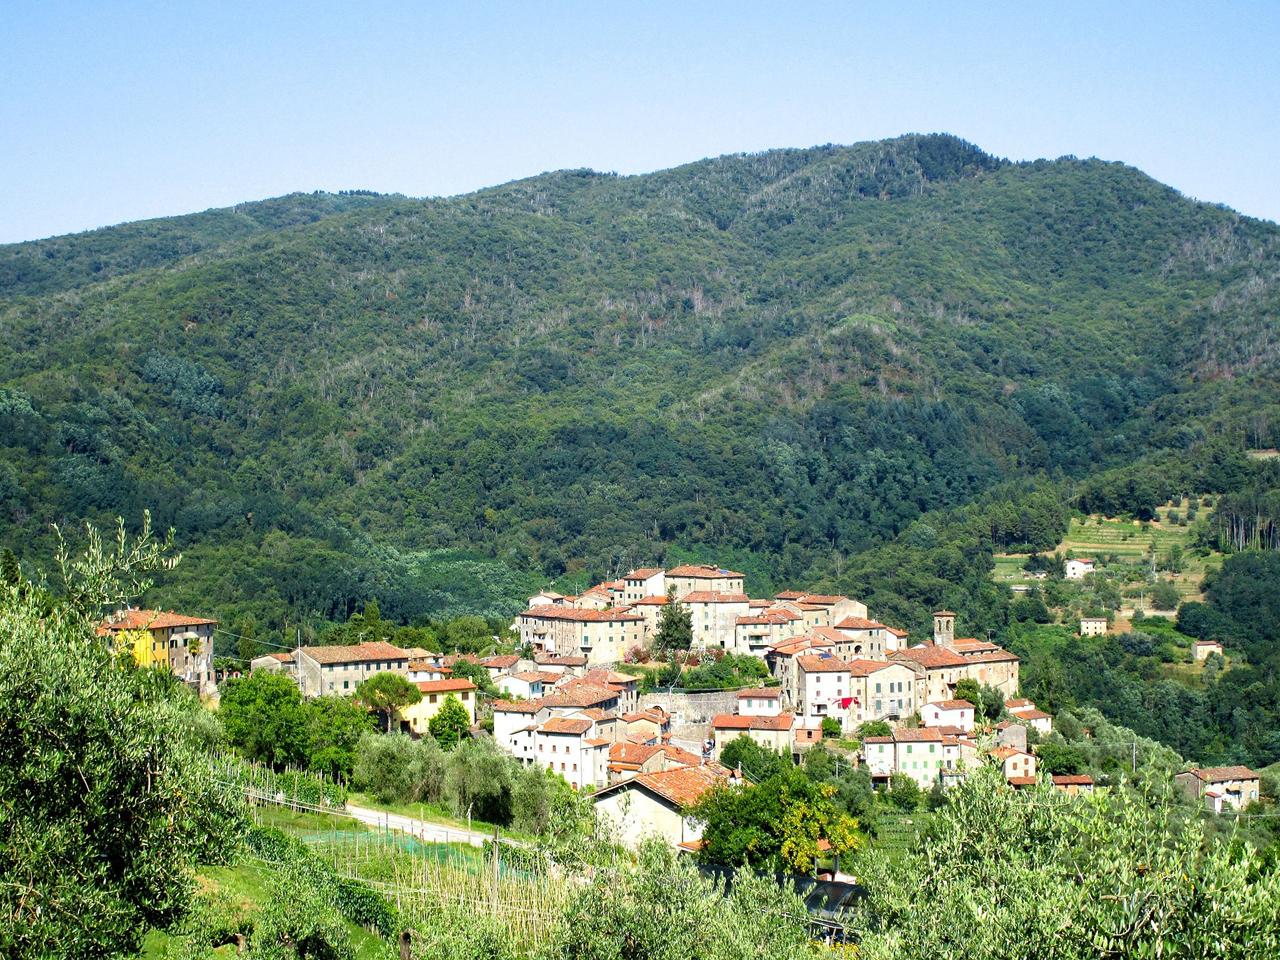 Castelvecchio  Photo credit: Pixabay